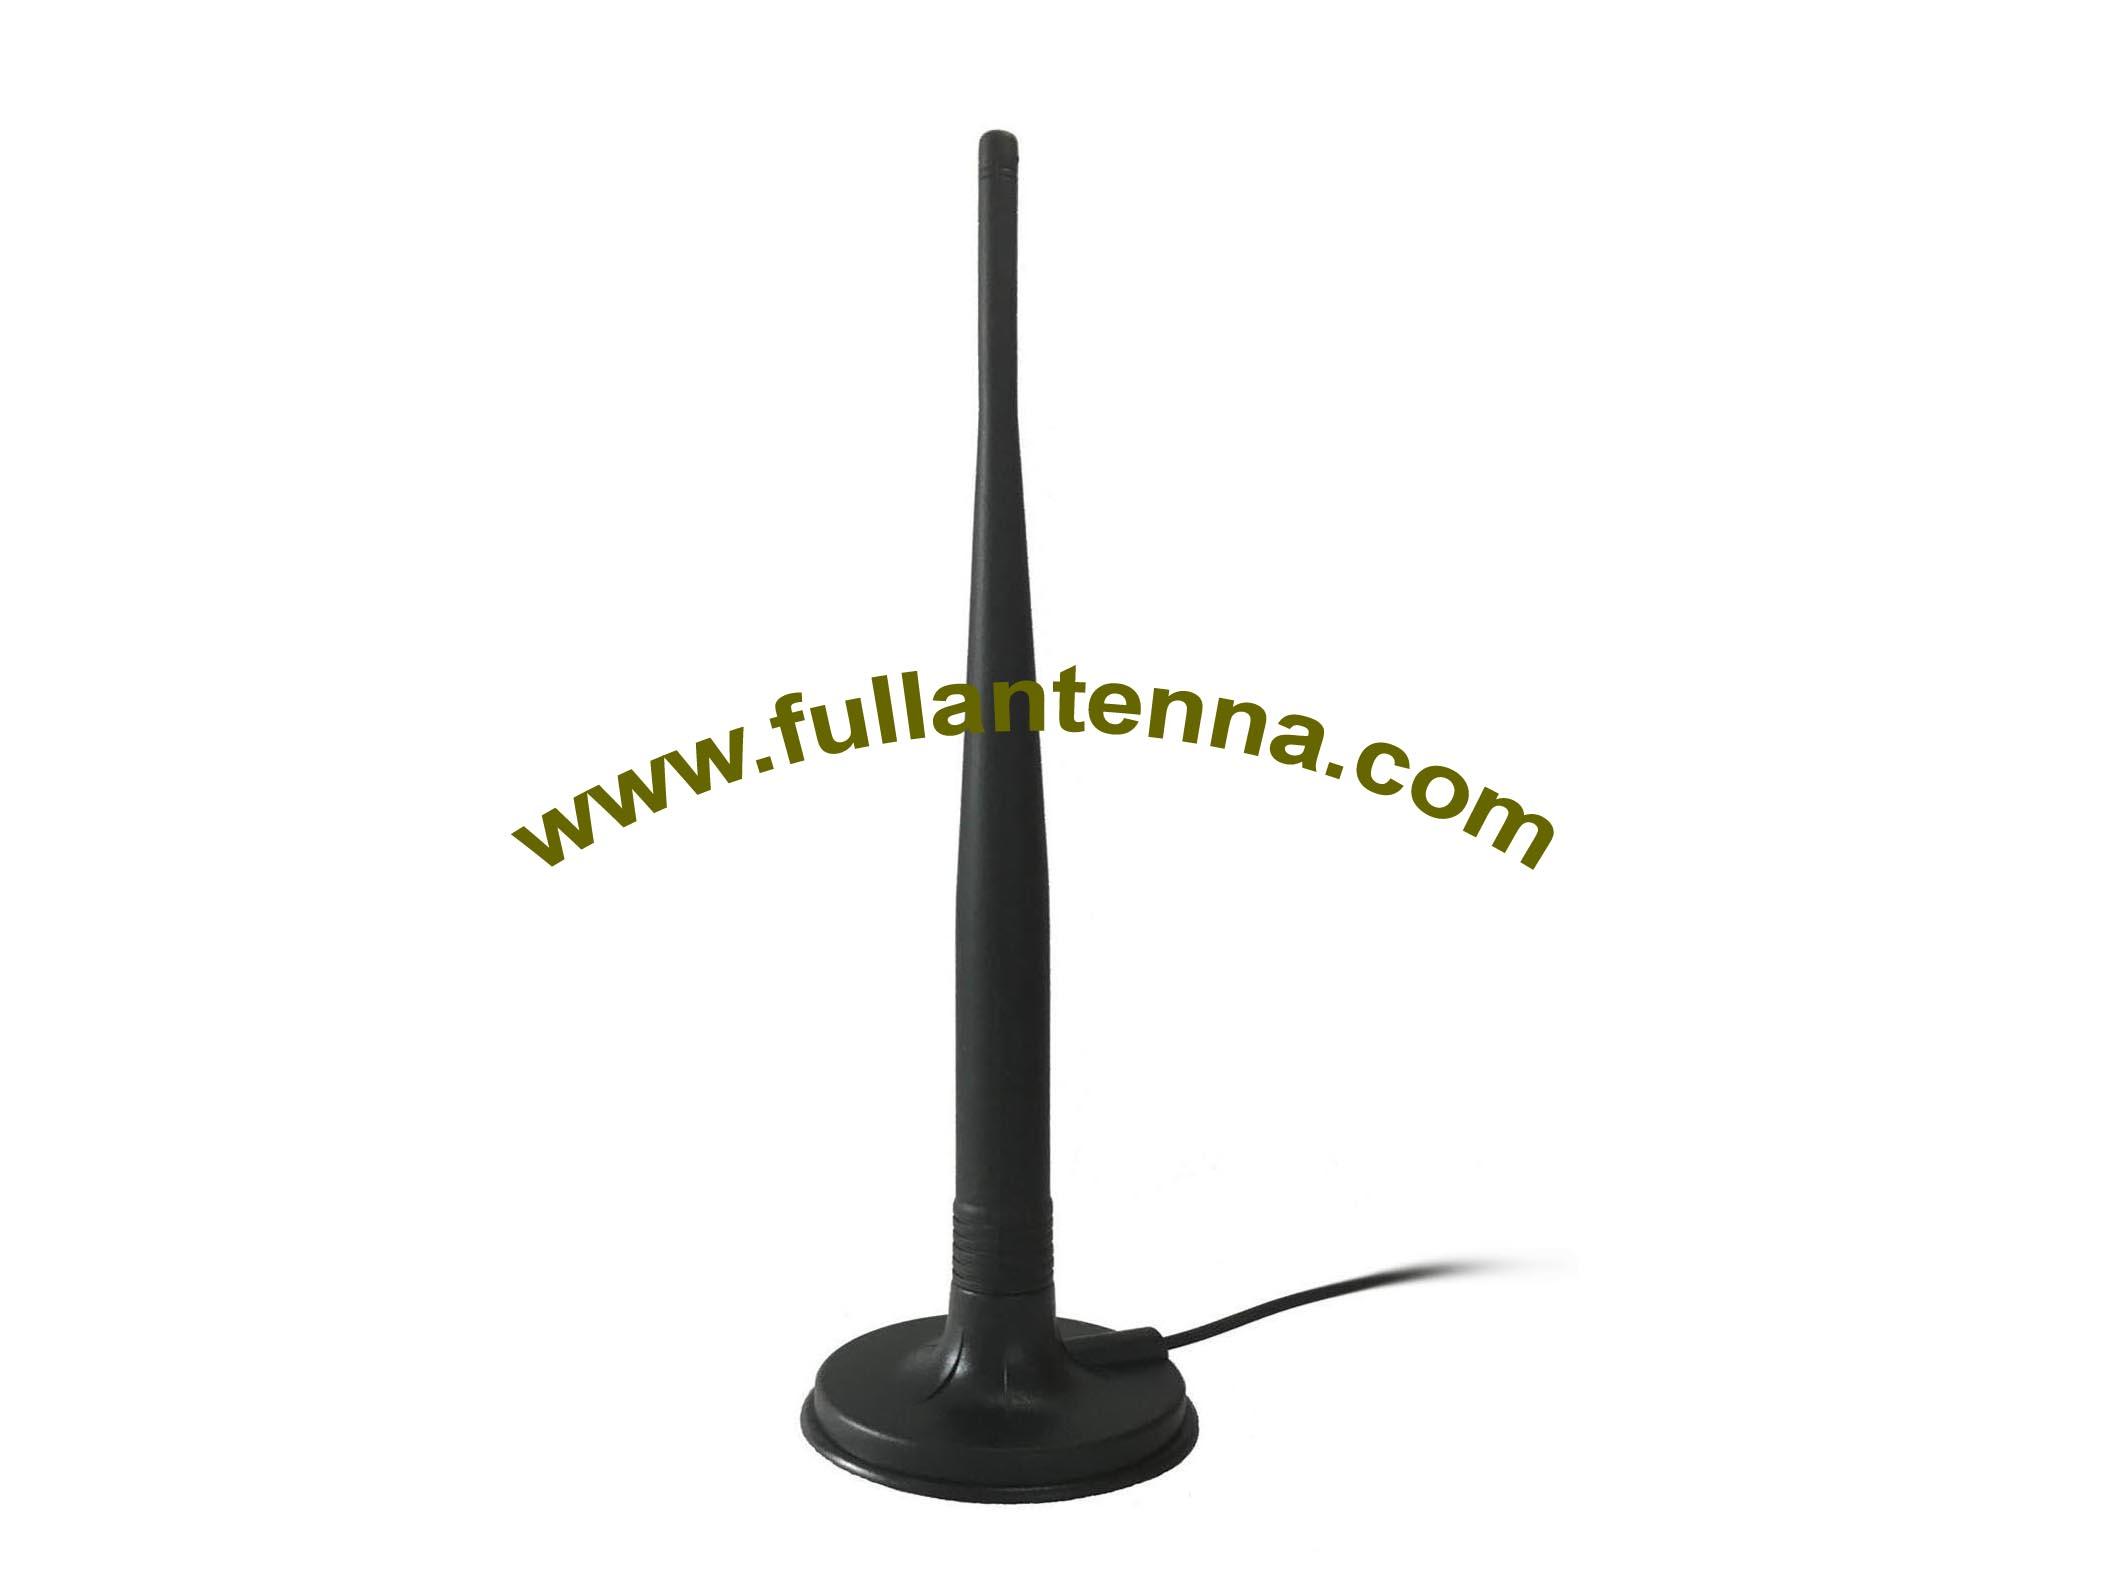 P/N:FA3G.31,3G External Antenna,3g,3G outdoor antenna 5dbi gain